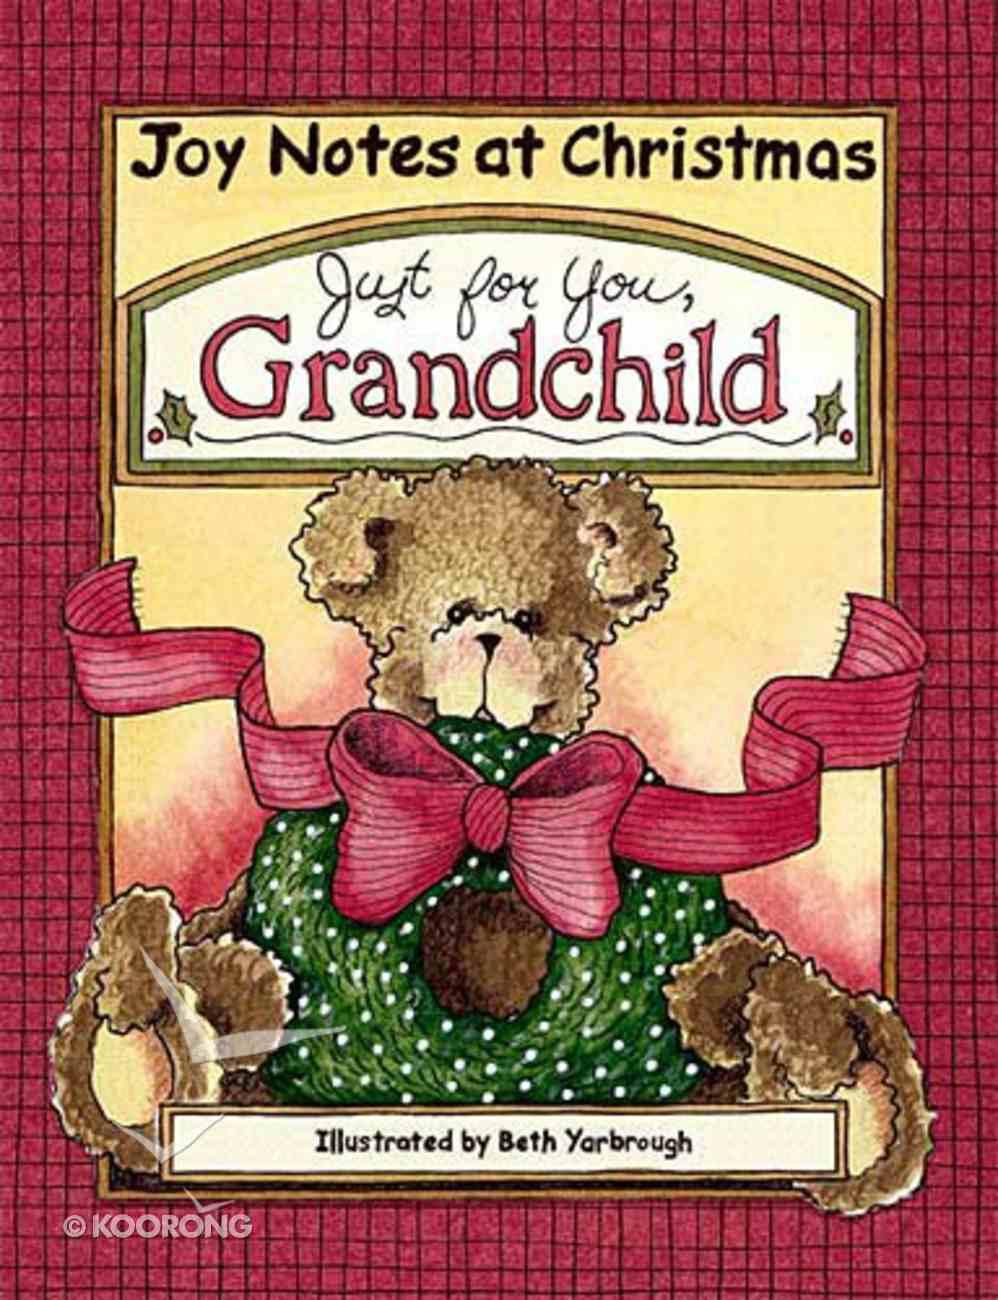 Just For You, Grandchild Hardback